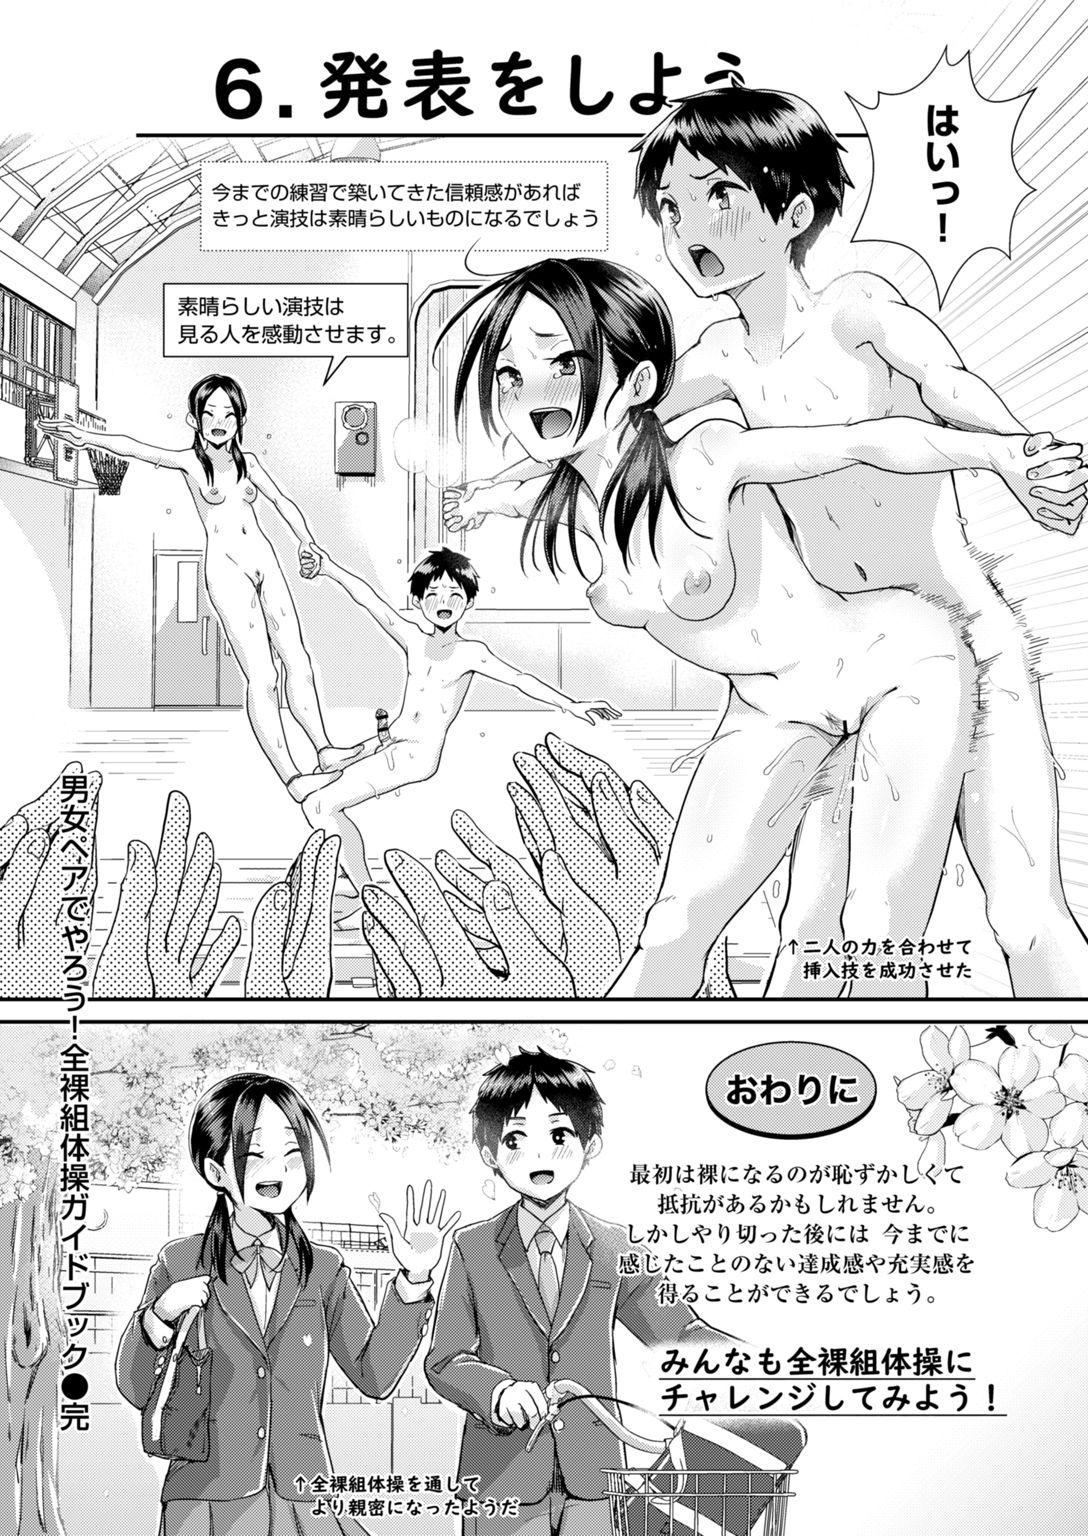 COMIC HAPPINING Vol. 2 46